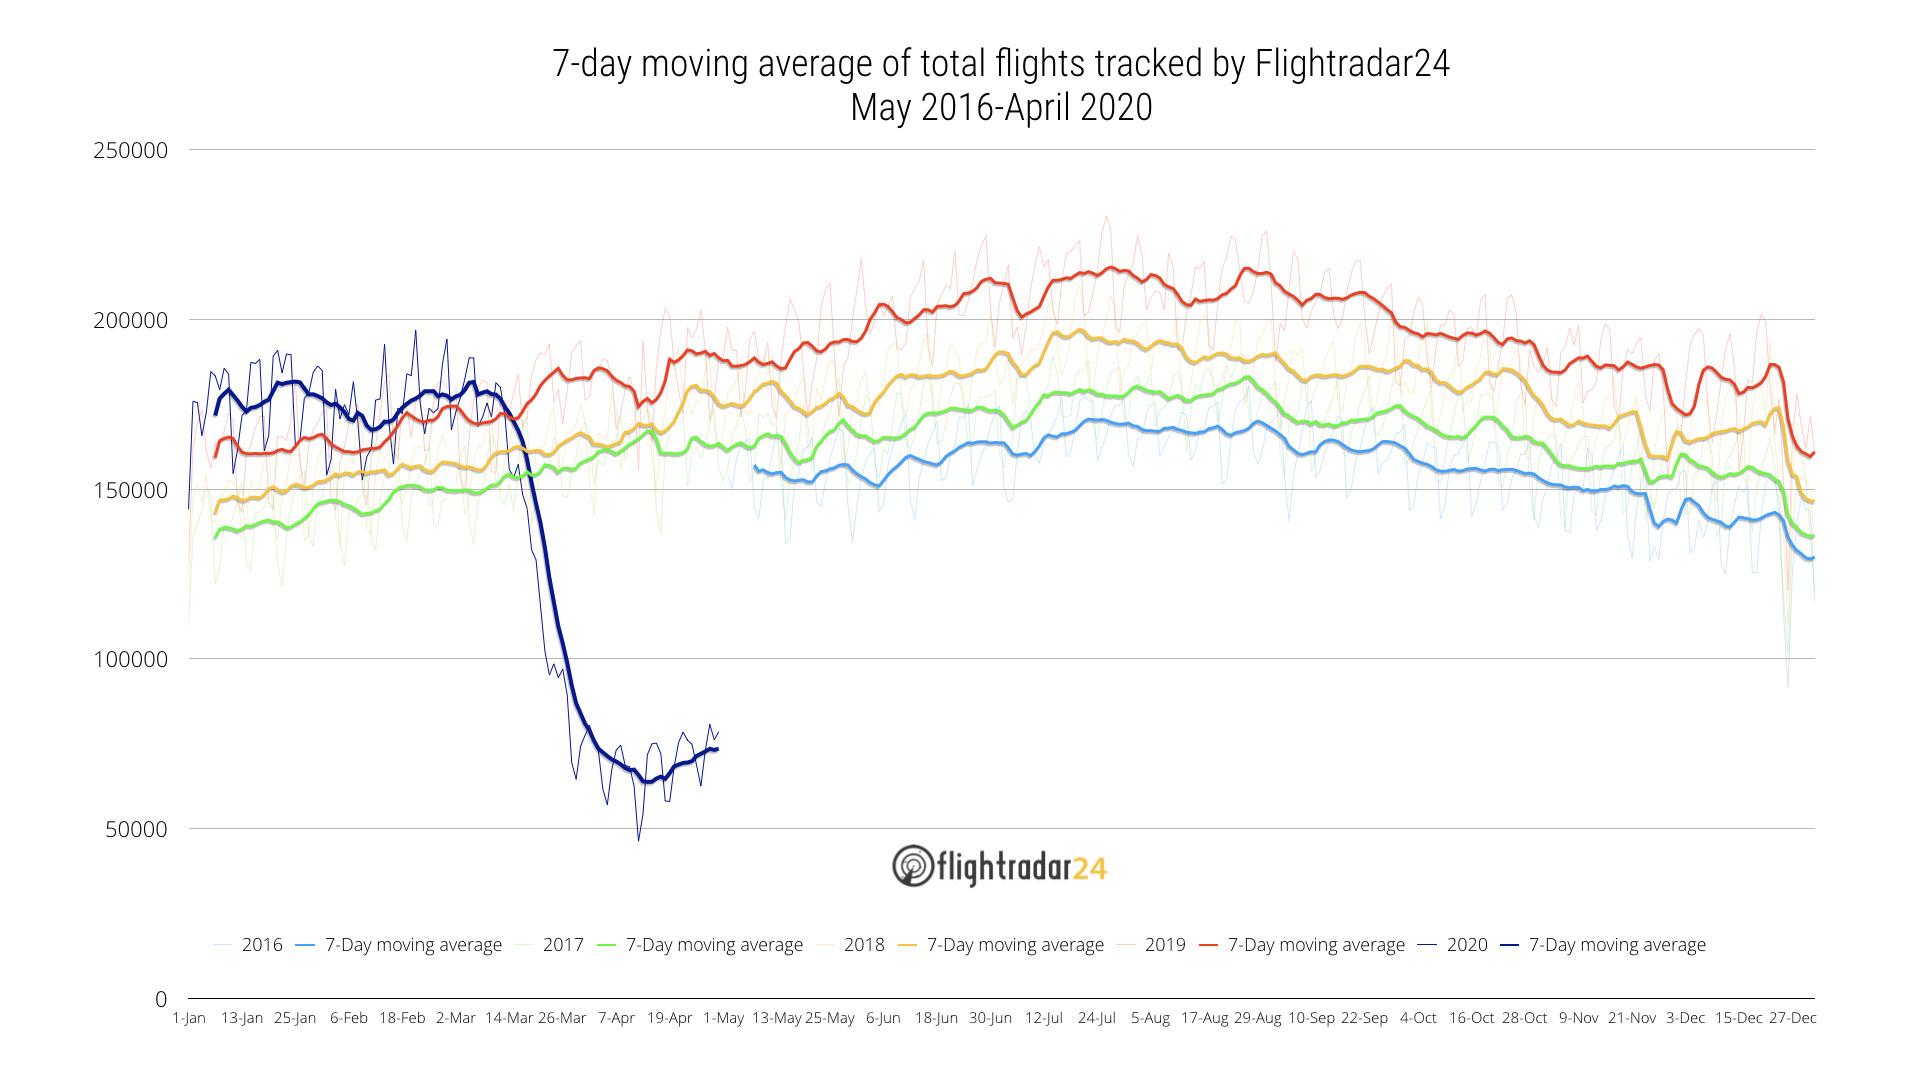 May 2016-April 2020 Total Flights tracked by Flightradar24